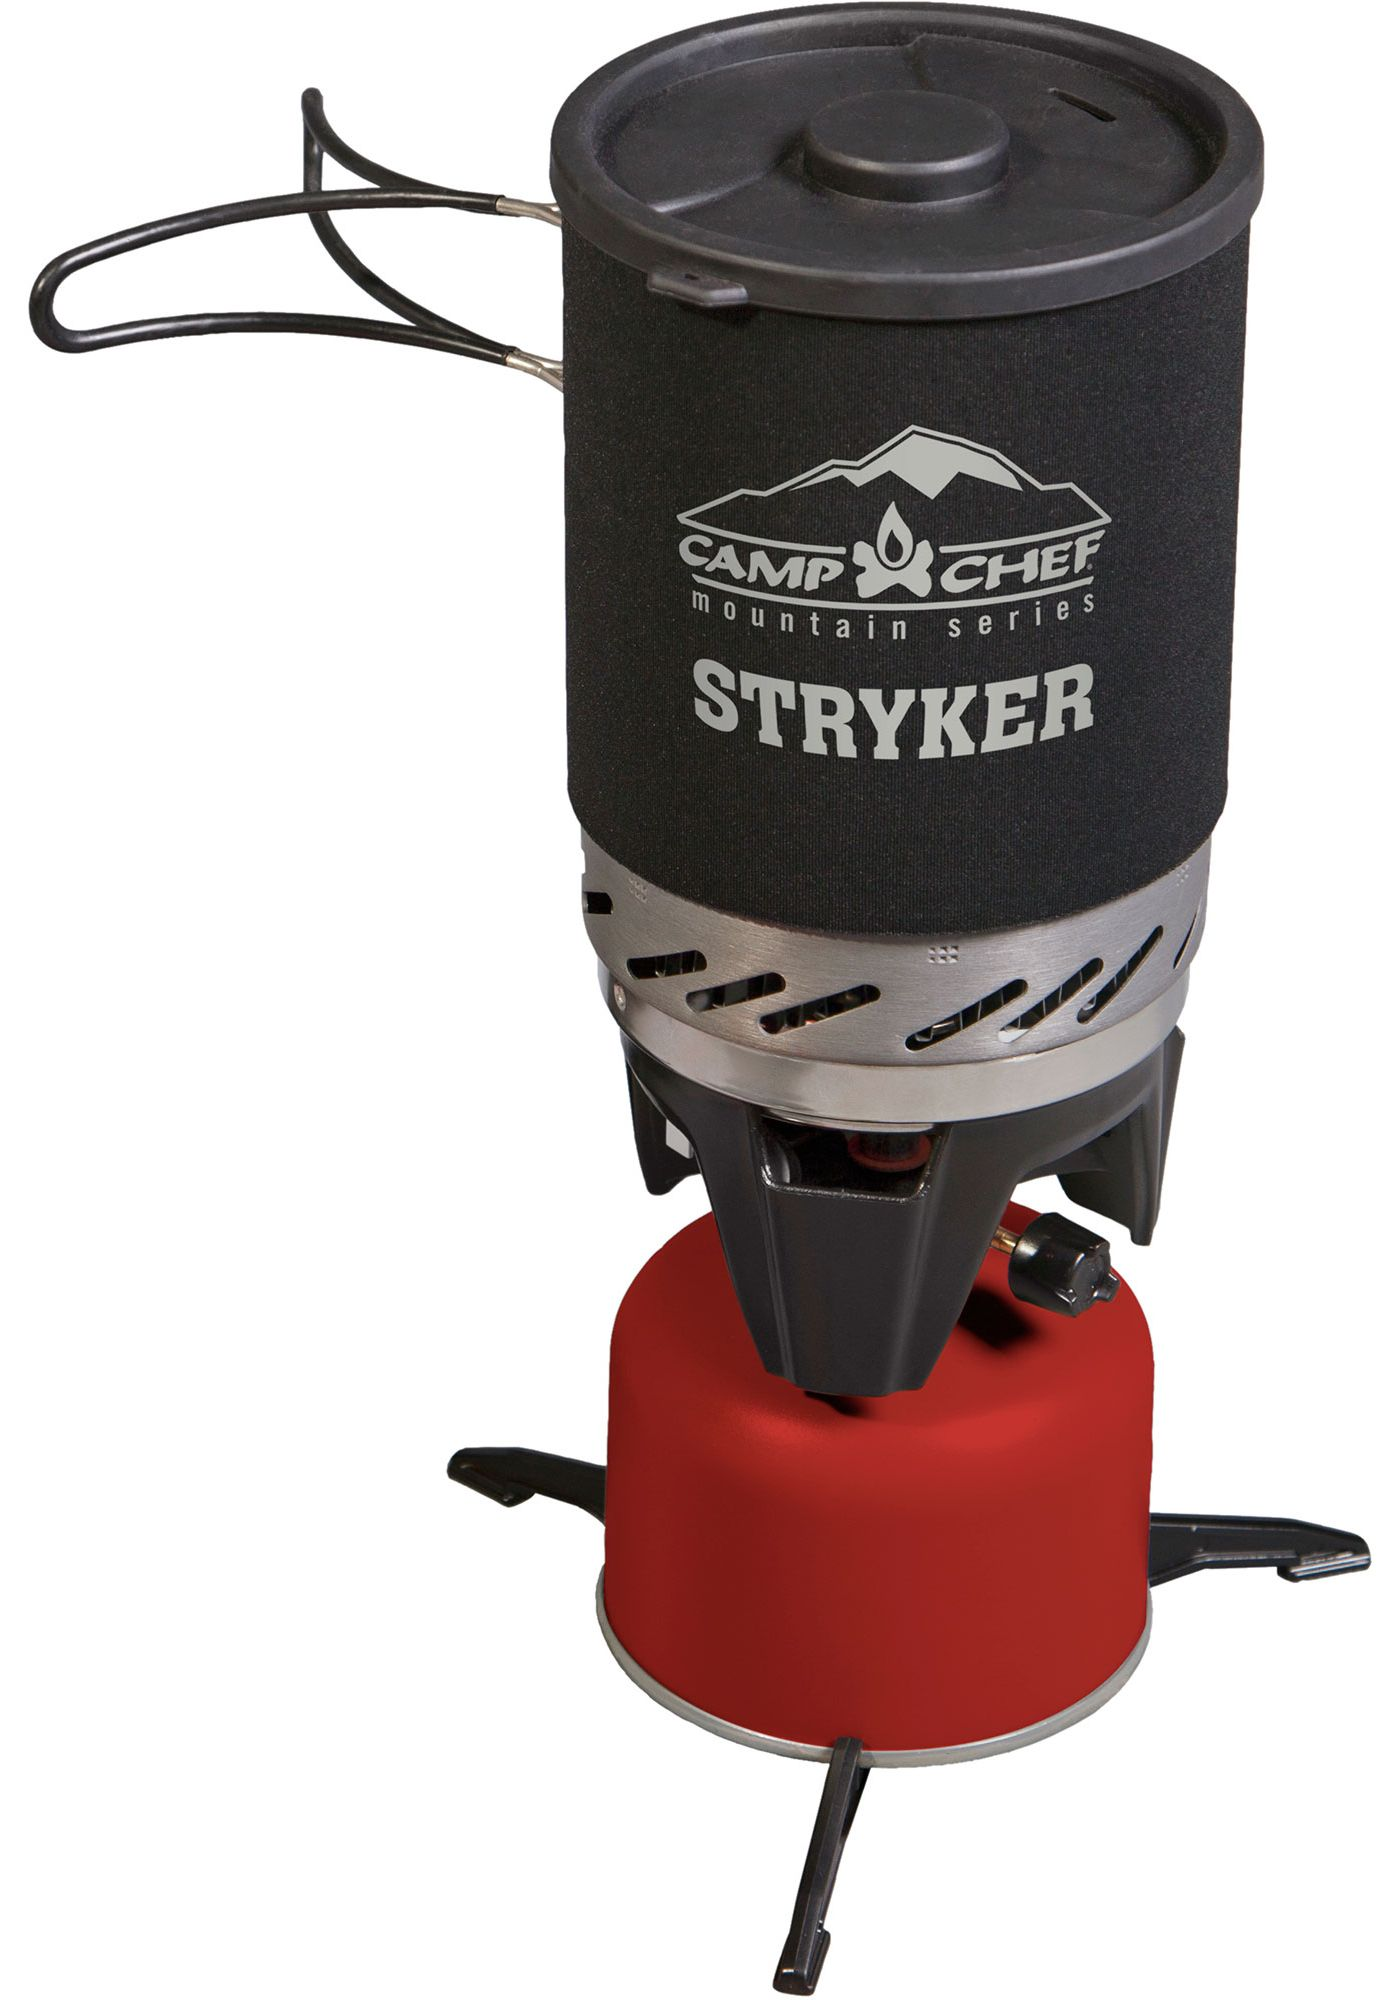 Camp Chef Stryker 100 Isobutane Backpacker Stove